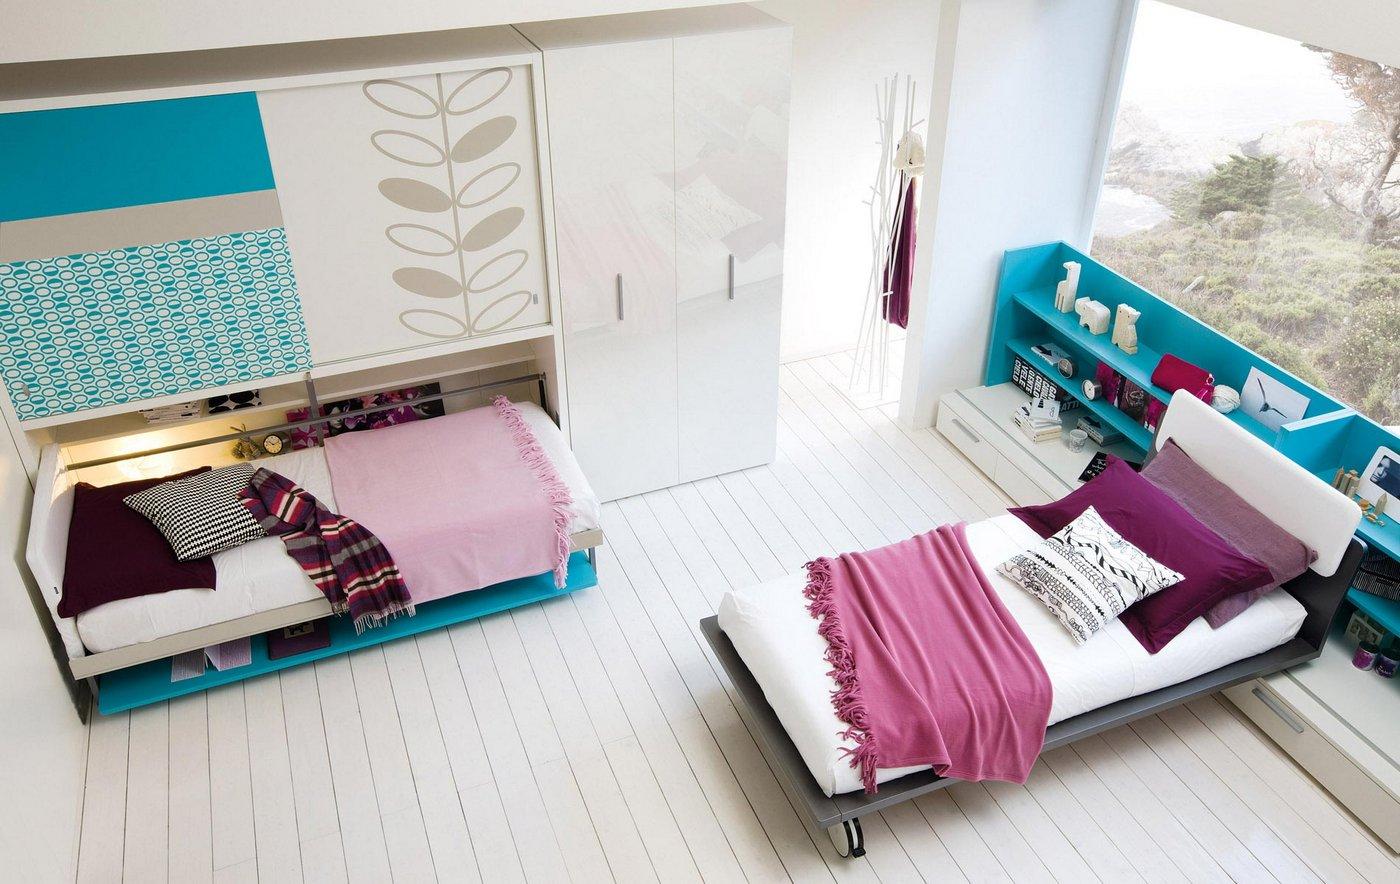 Scrivania A Scomparsa Clei : Clei letti a scomparsa idee di design per la casa rustify